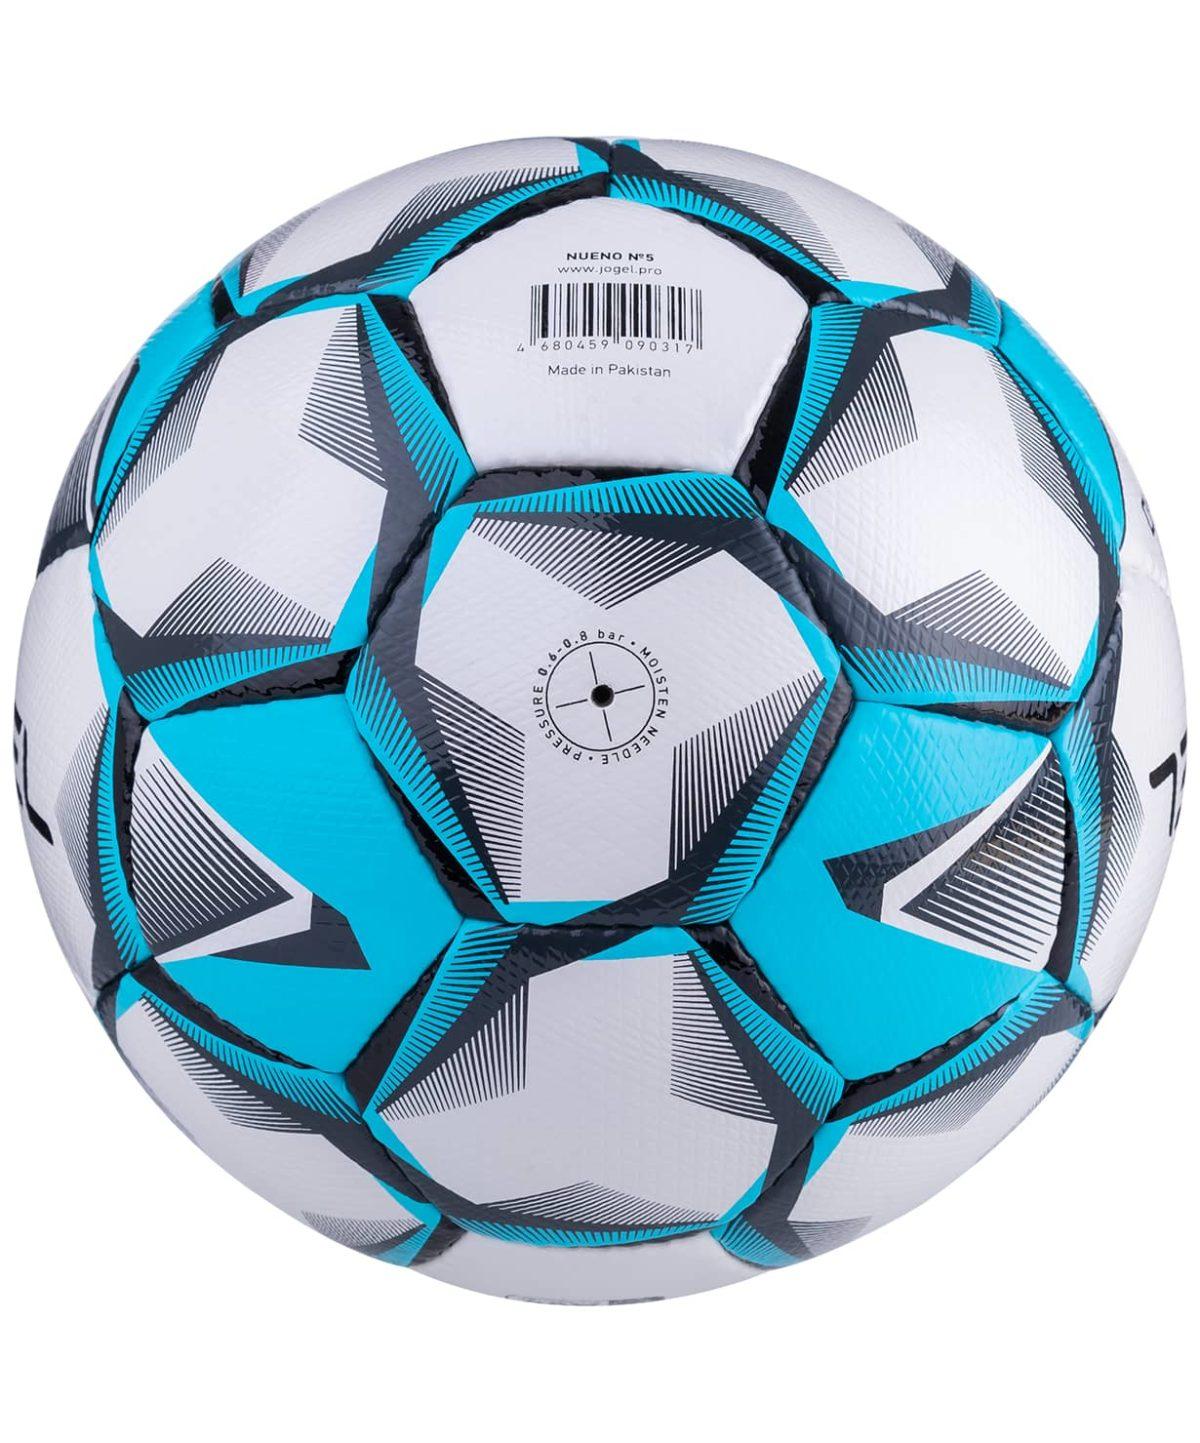 JOGEL Nueno Мяч футбольный  Nueno №5 (BC-20) - 6